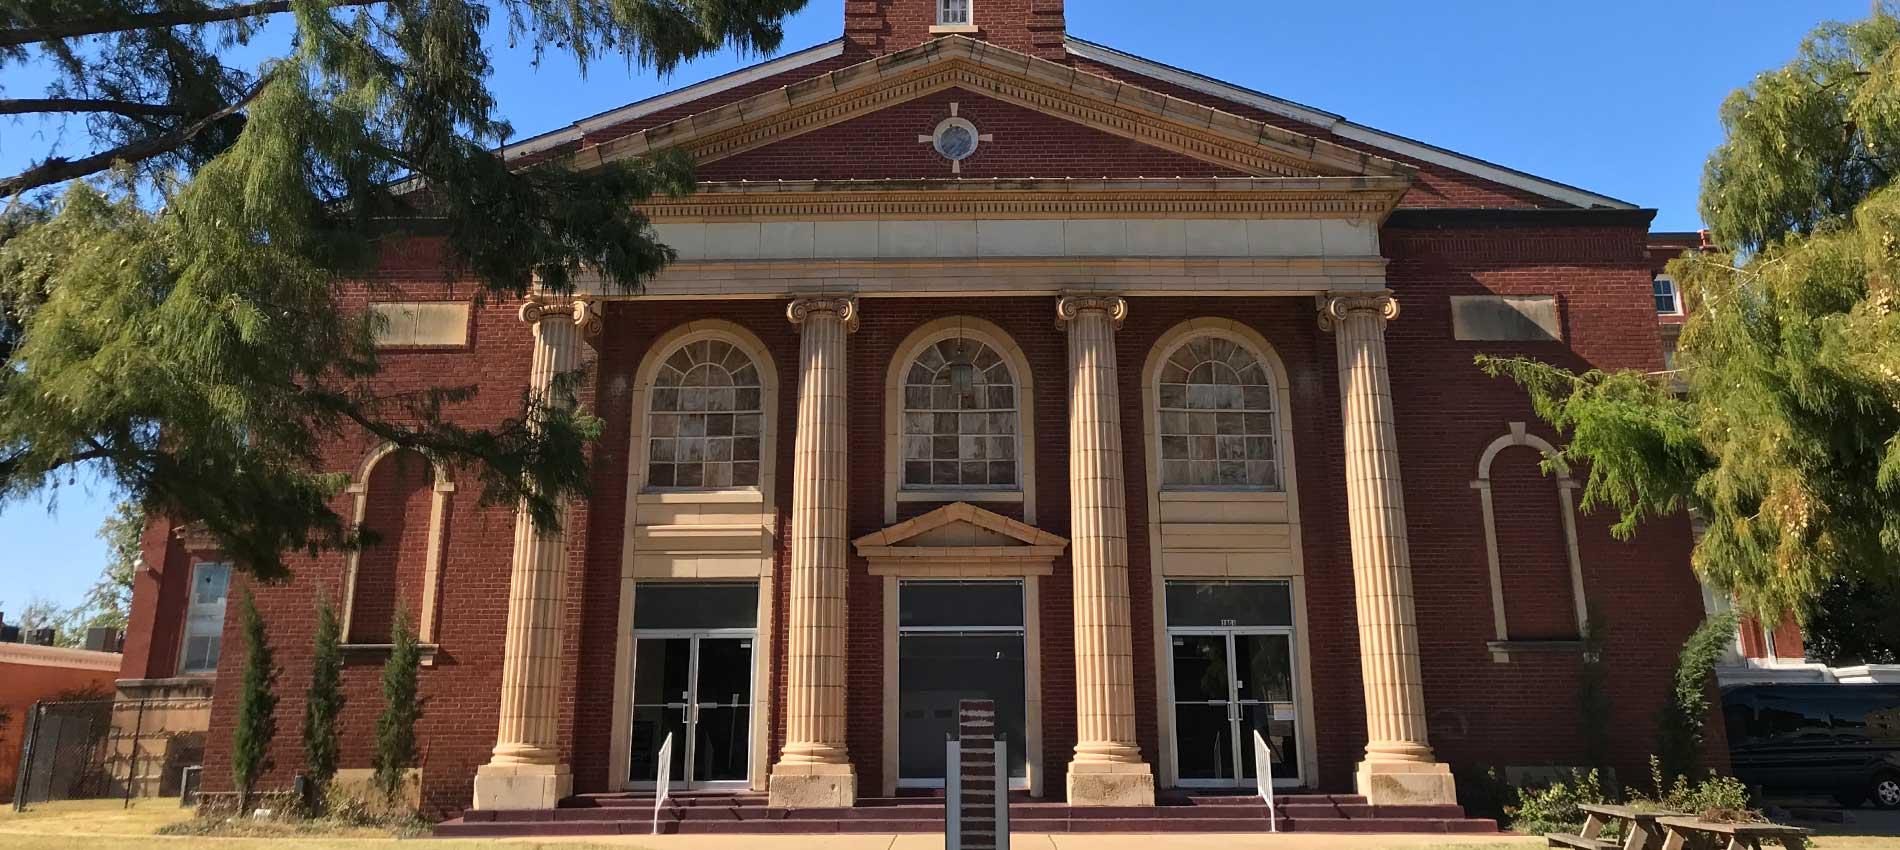 Audio visual services for churches Oklahoma city Edmond Tulsa